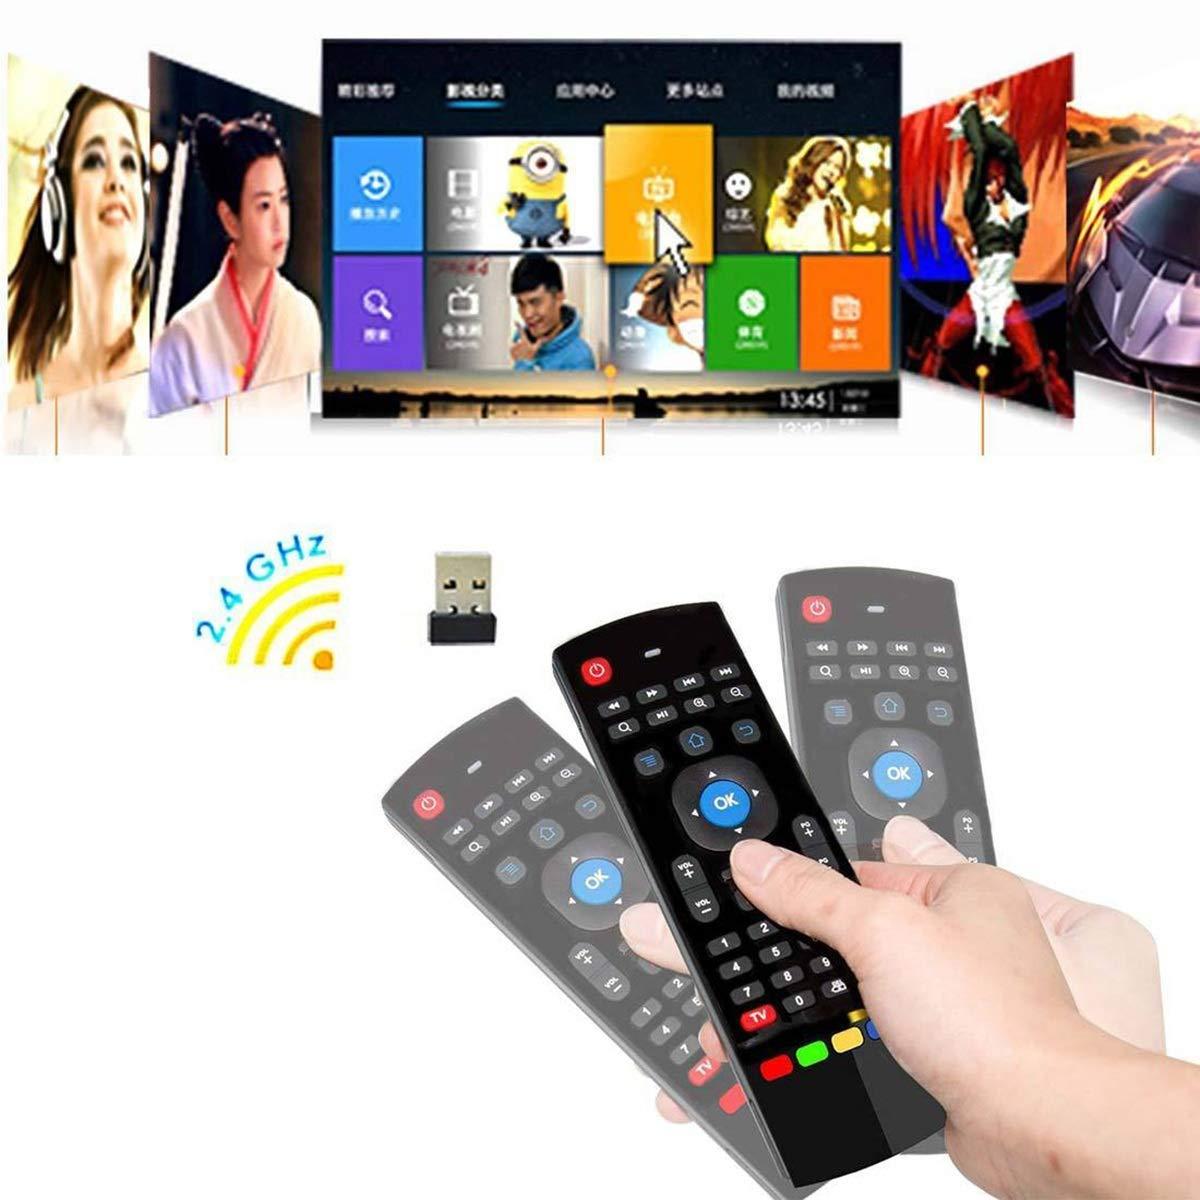 MX3 4 IN 1 Air Mouse Control Remoto inalámbrico para Android Box Smart TV PCLaptop: Amazon.es: Hogar